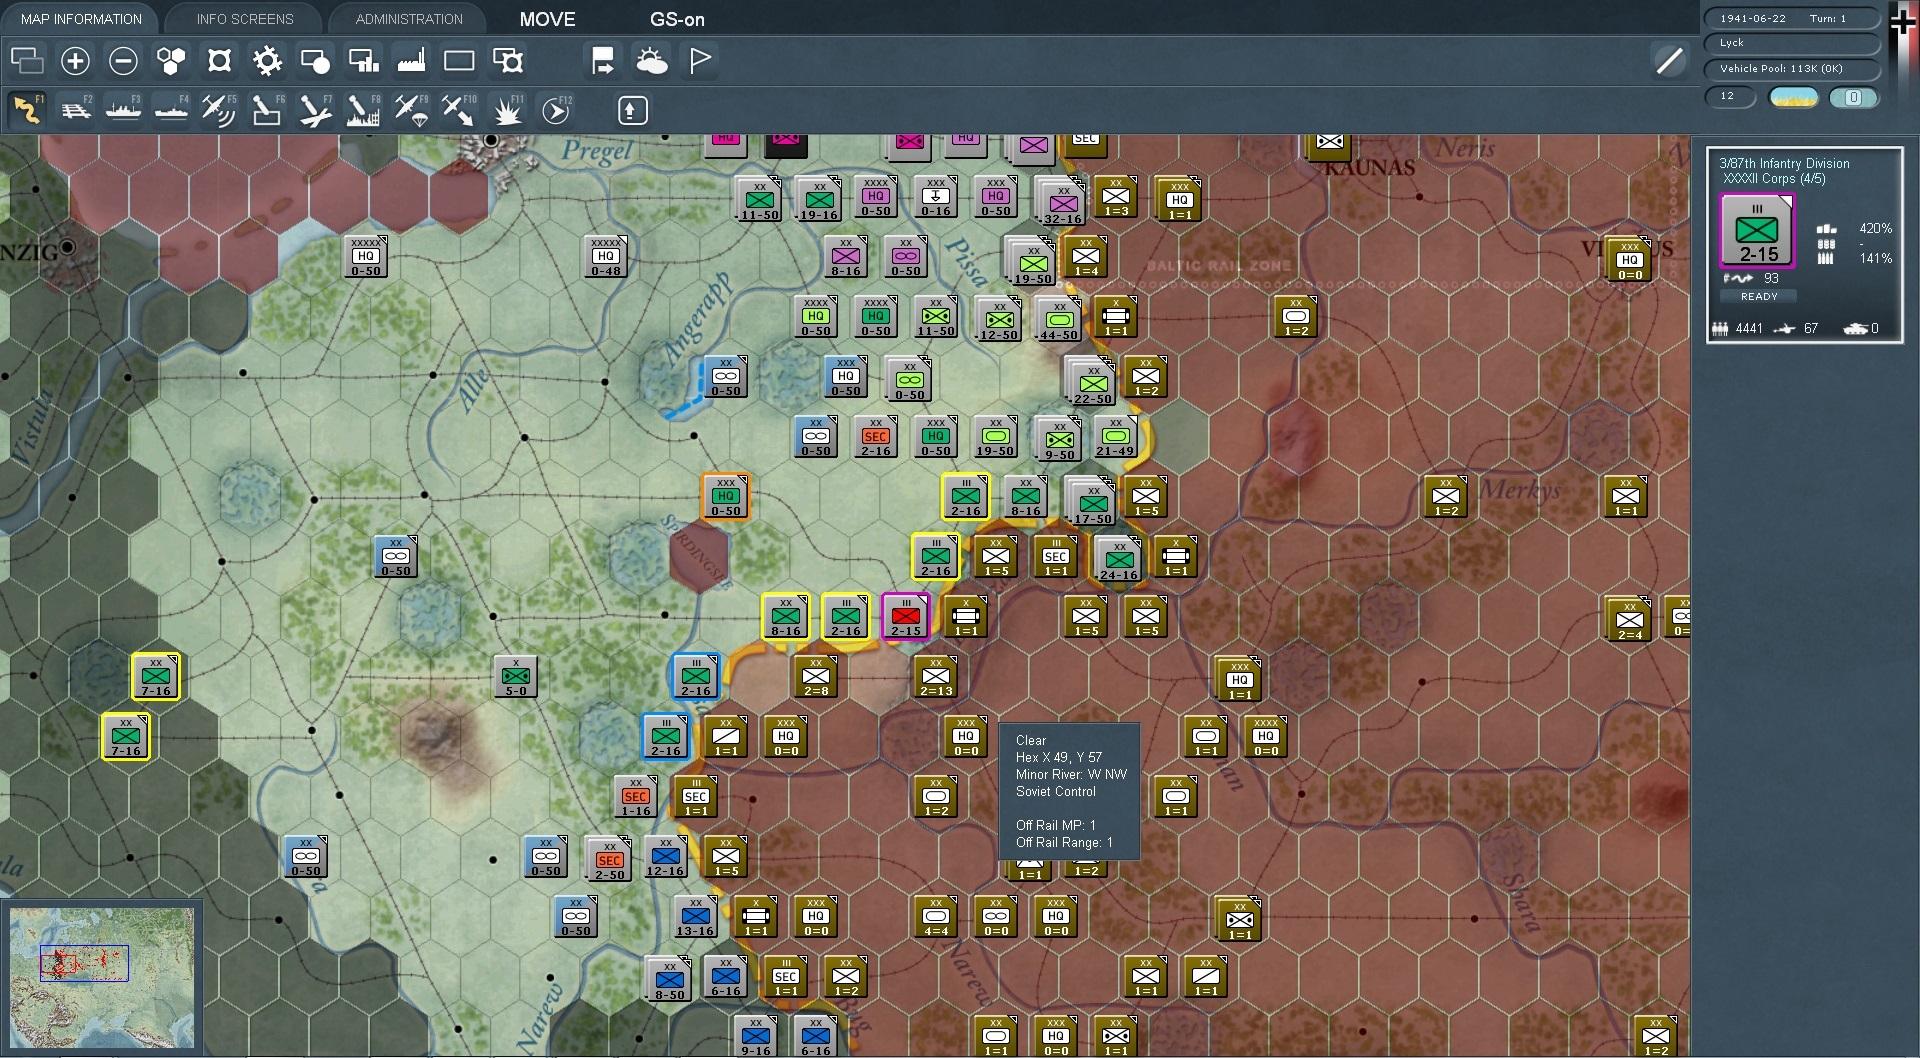 Best ww2 strategy games gary grigsbys war in the east - WW2 games: the best World War II games